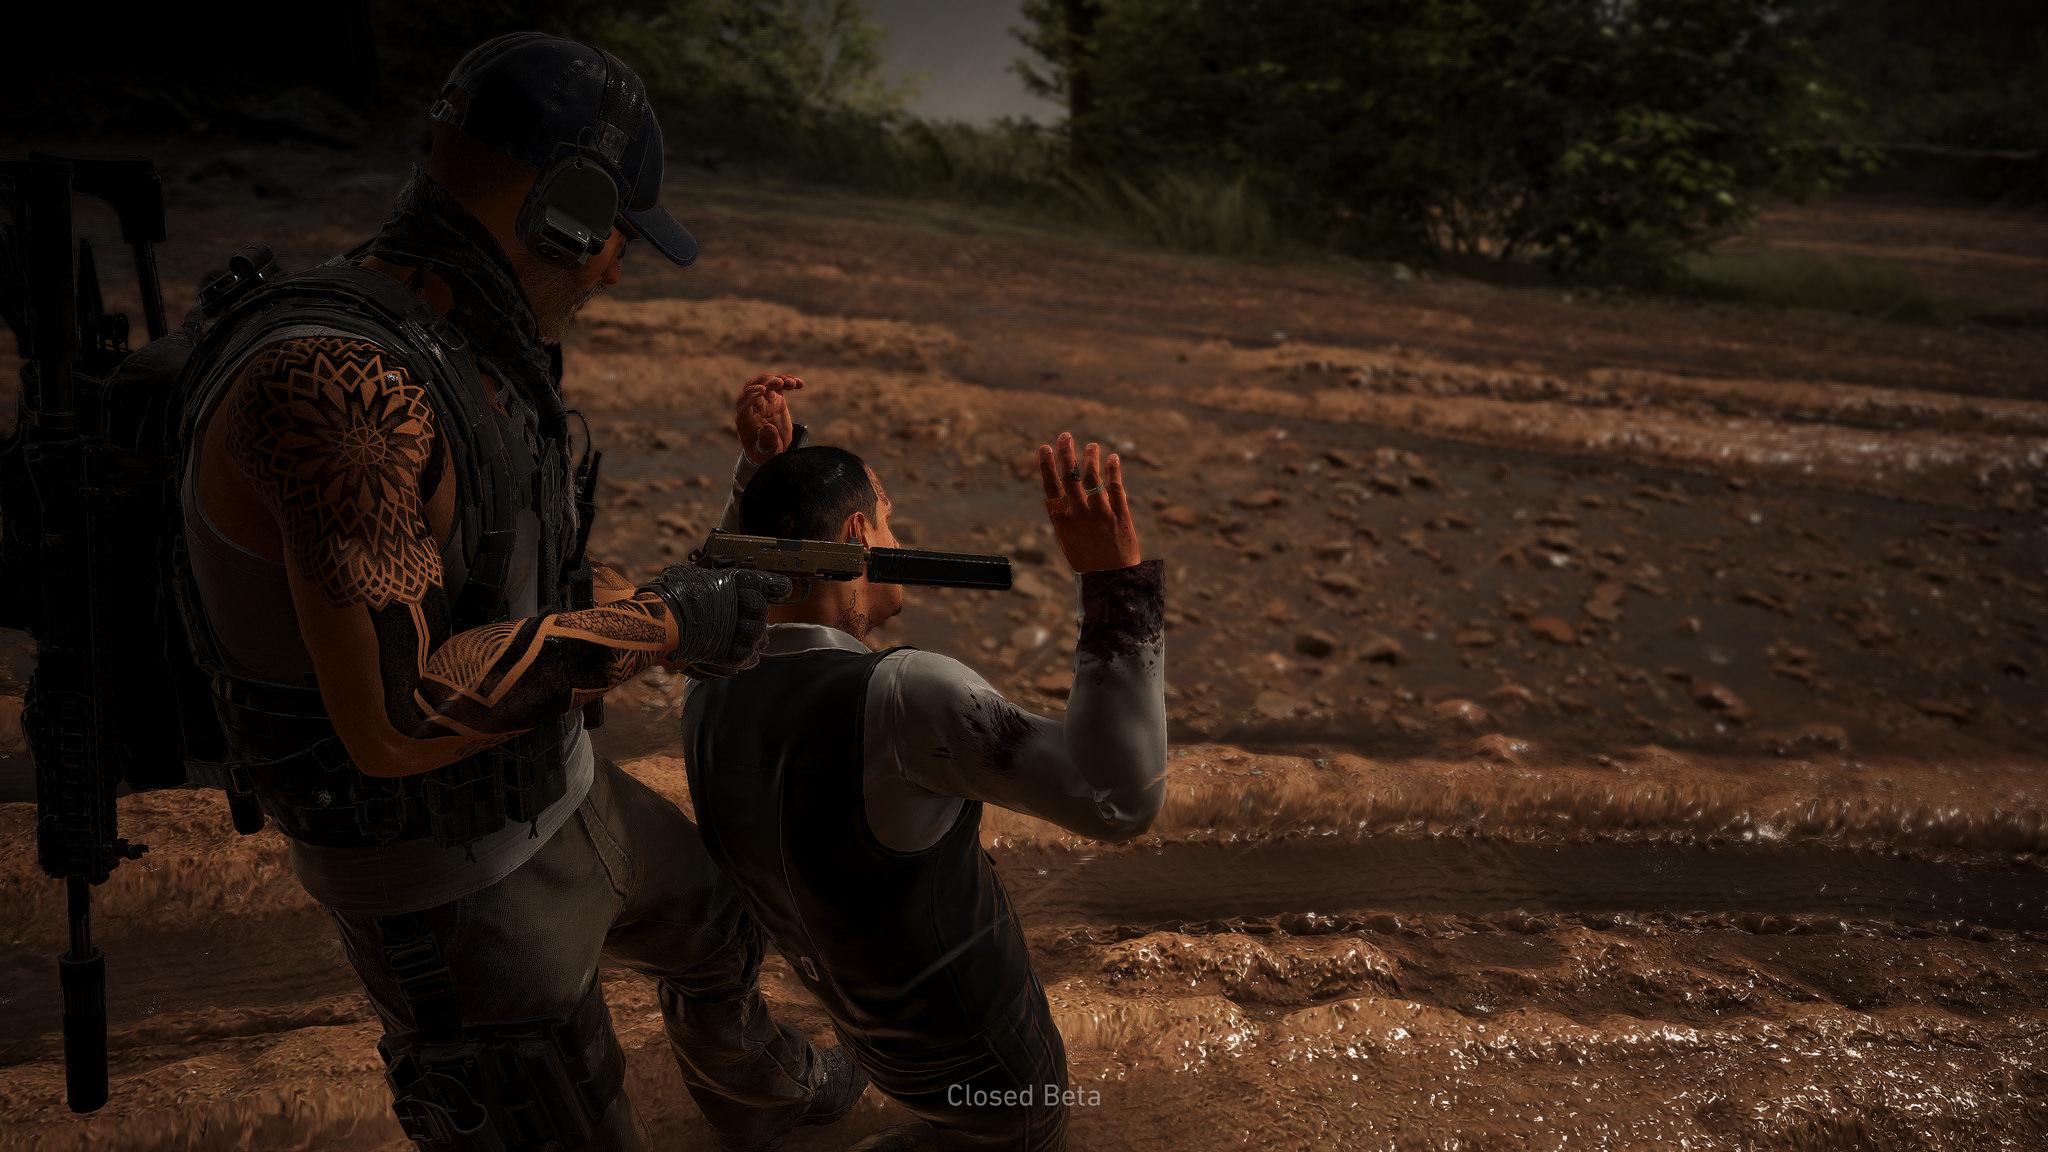 Preview Ghost Recon Wildlands Closed Beta 4K Screenshots